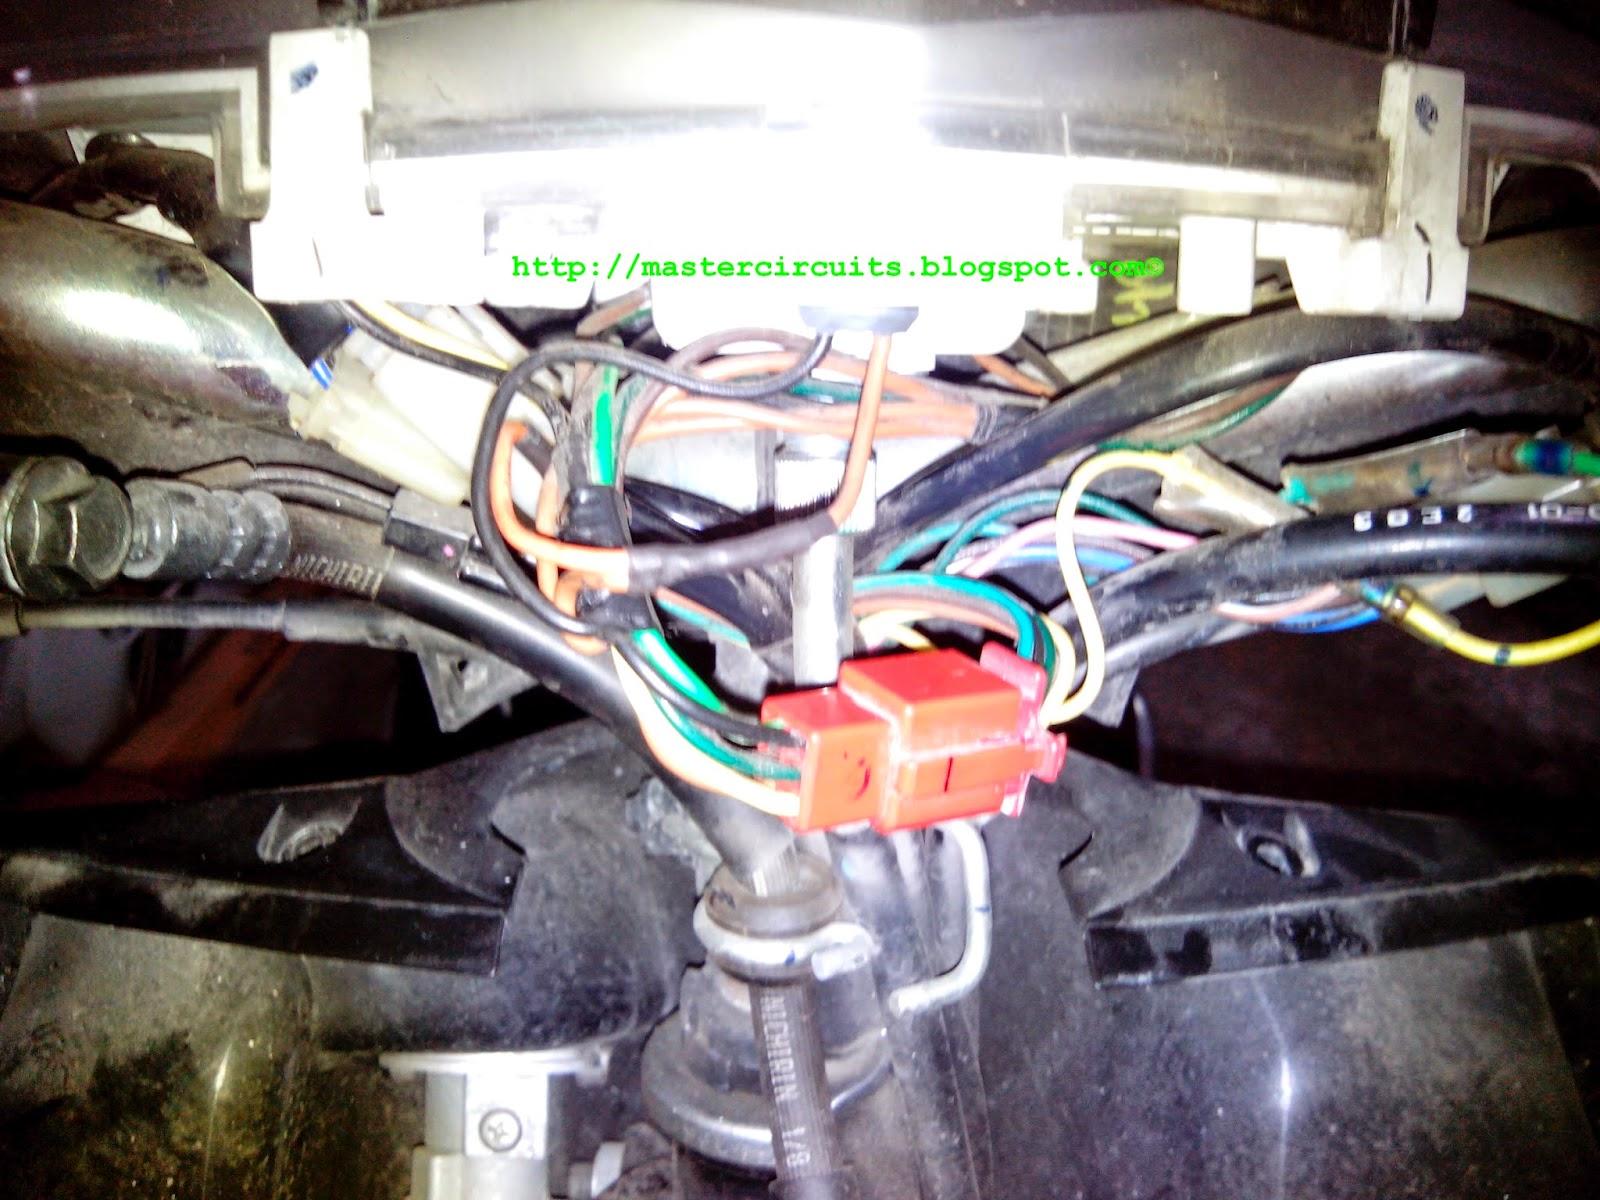 Yamaha Mio Soul Led Headlight Conversion | Techy at day